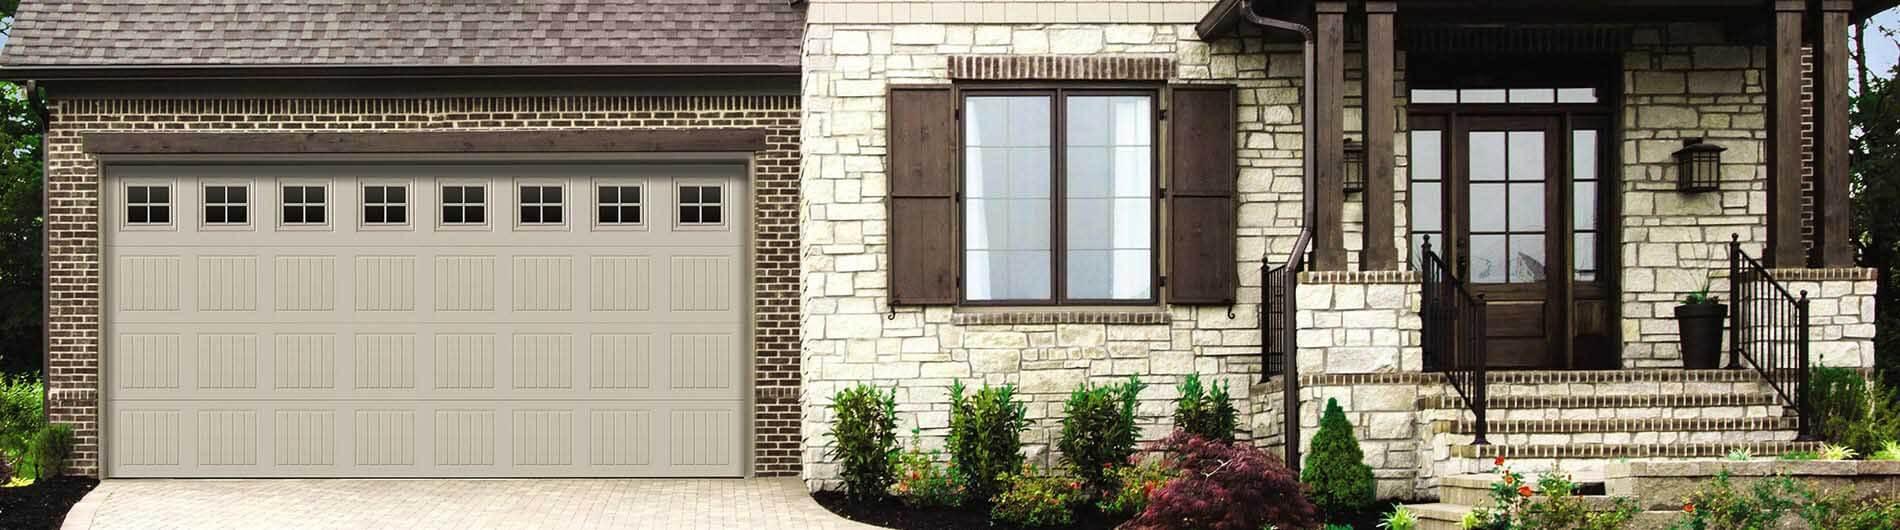 VINYL SONOMA MONTEREY SAND STOCKTONL JOHN DALTON GARAGE DOORS REVIEW